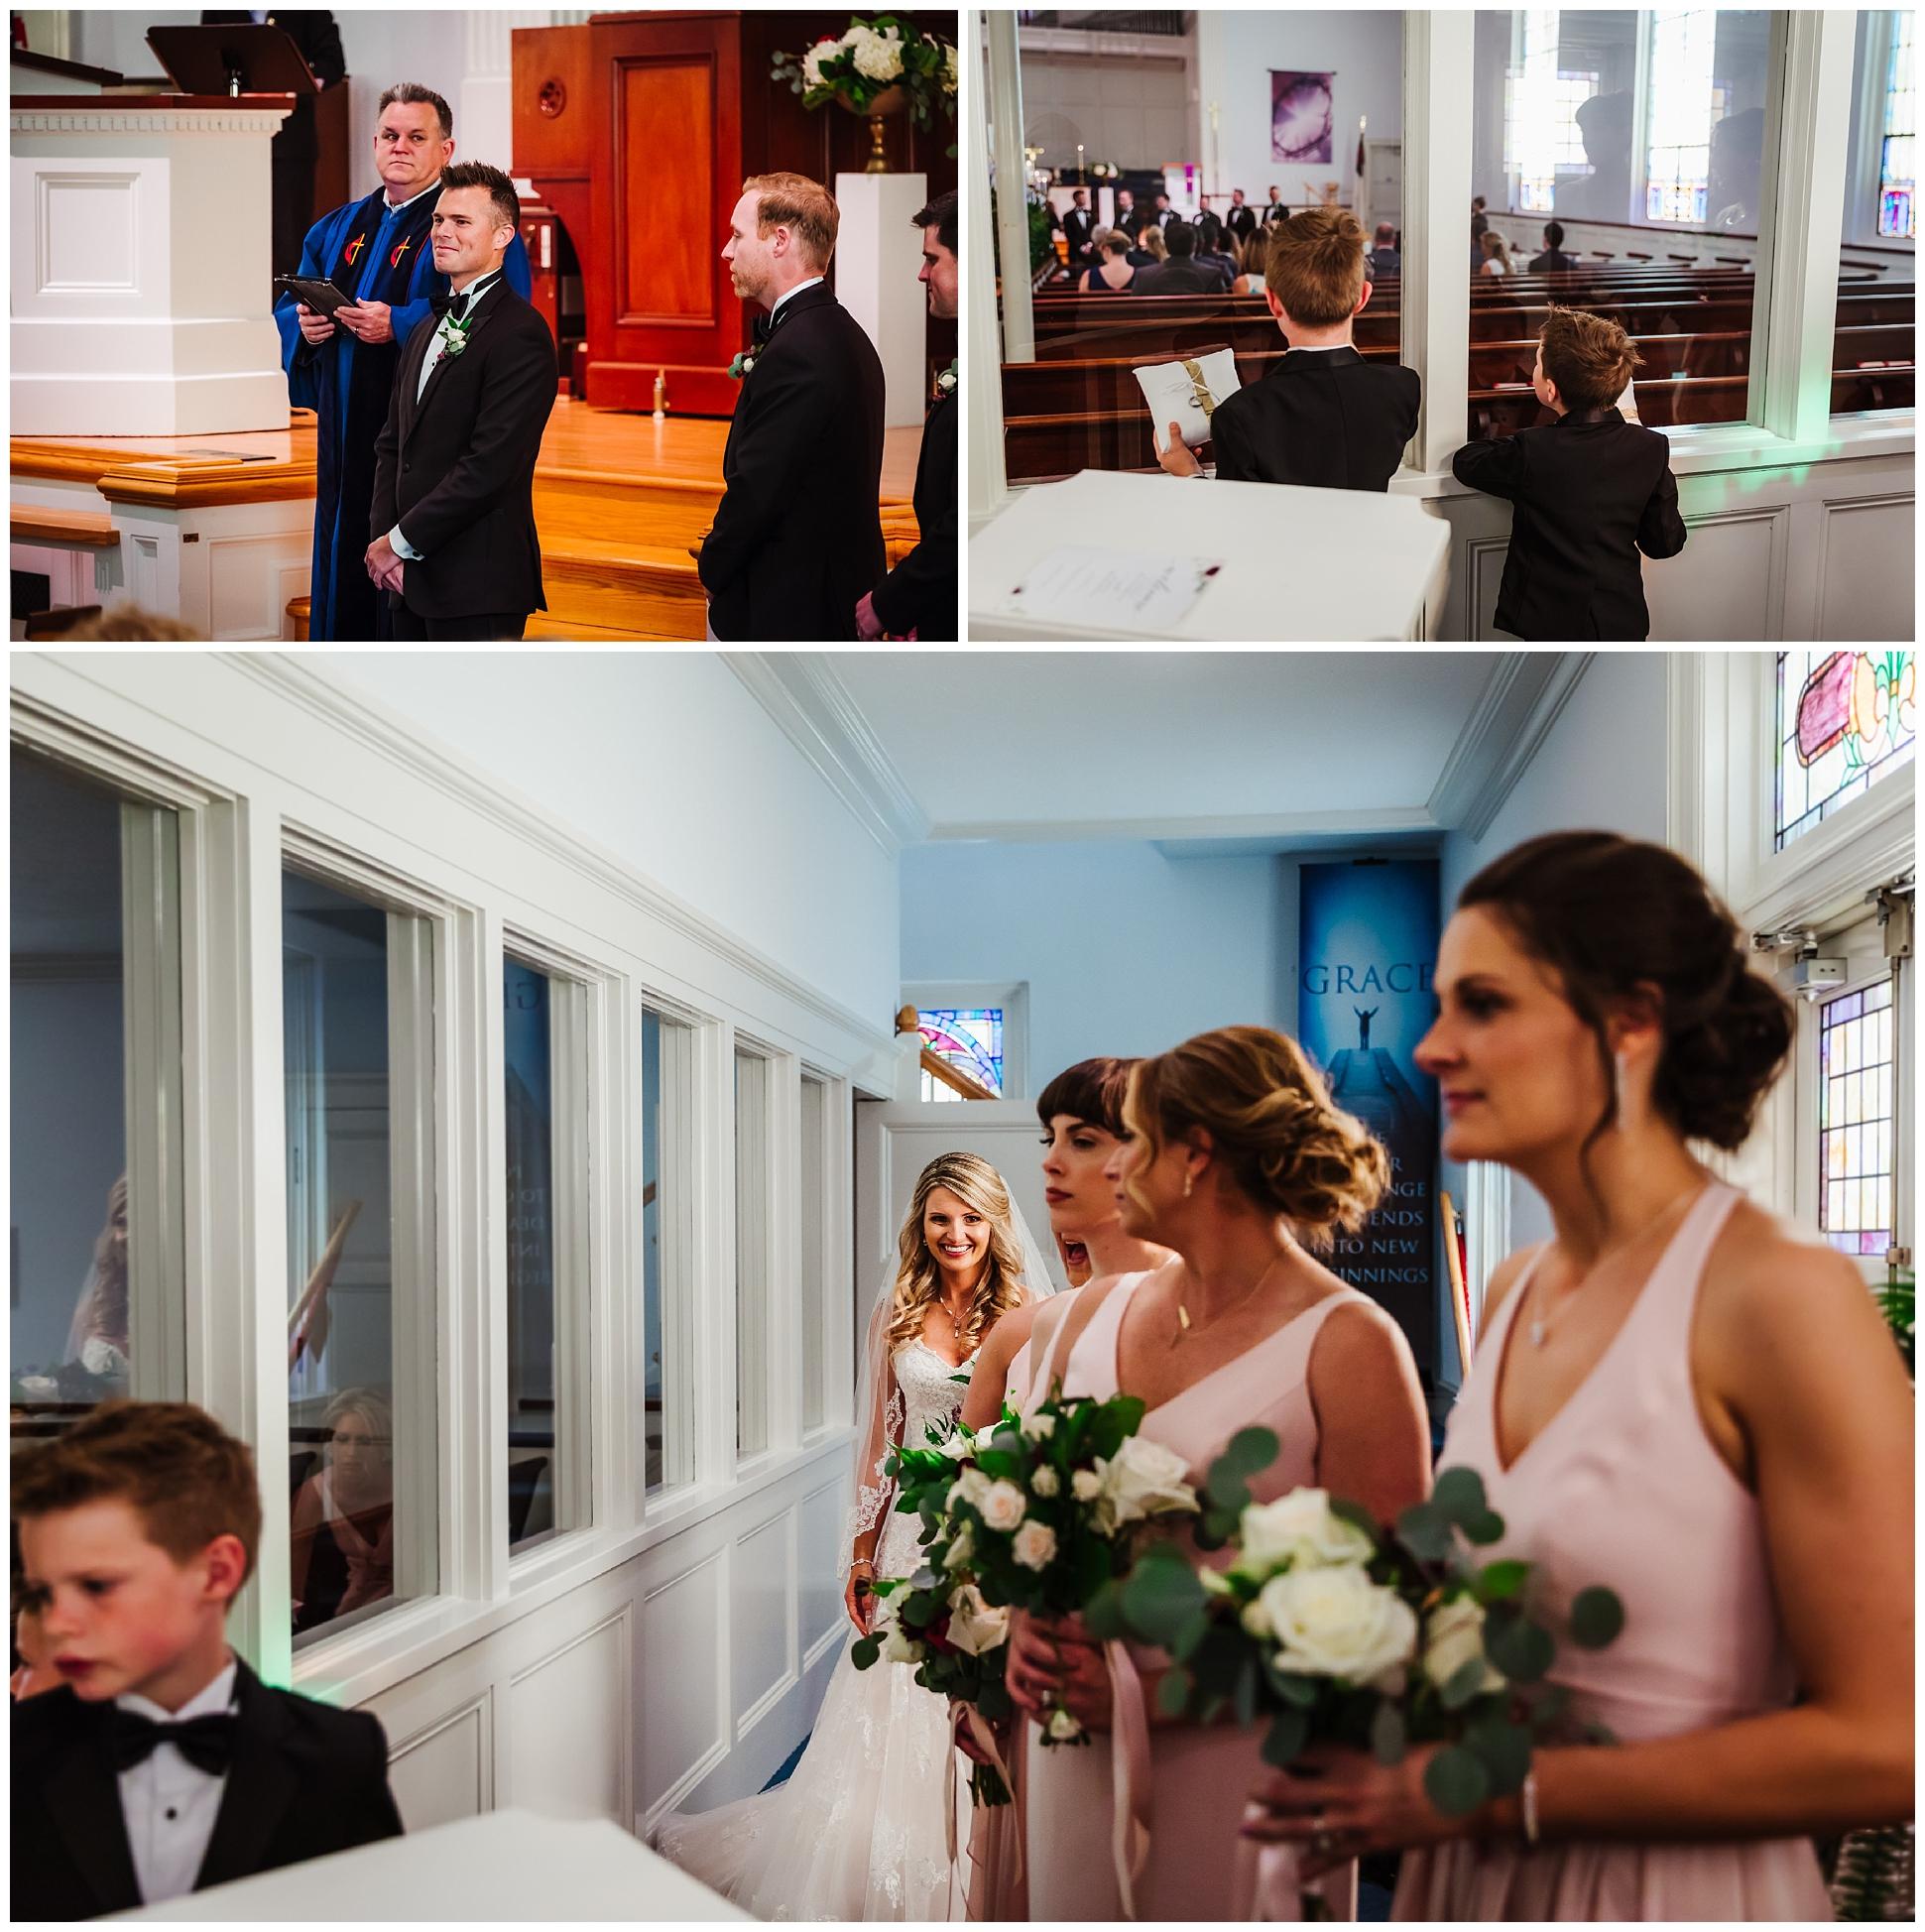 tampa-bradenton-wedding-photographer-south-florida-museum-classic-blush-gold-alpacas-sparklers_0044.jpg